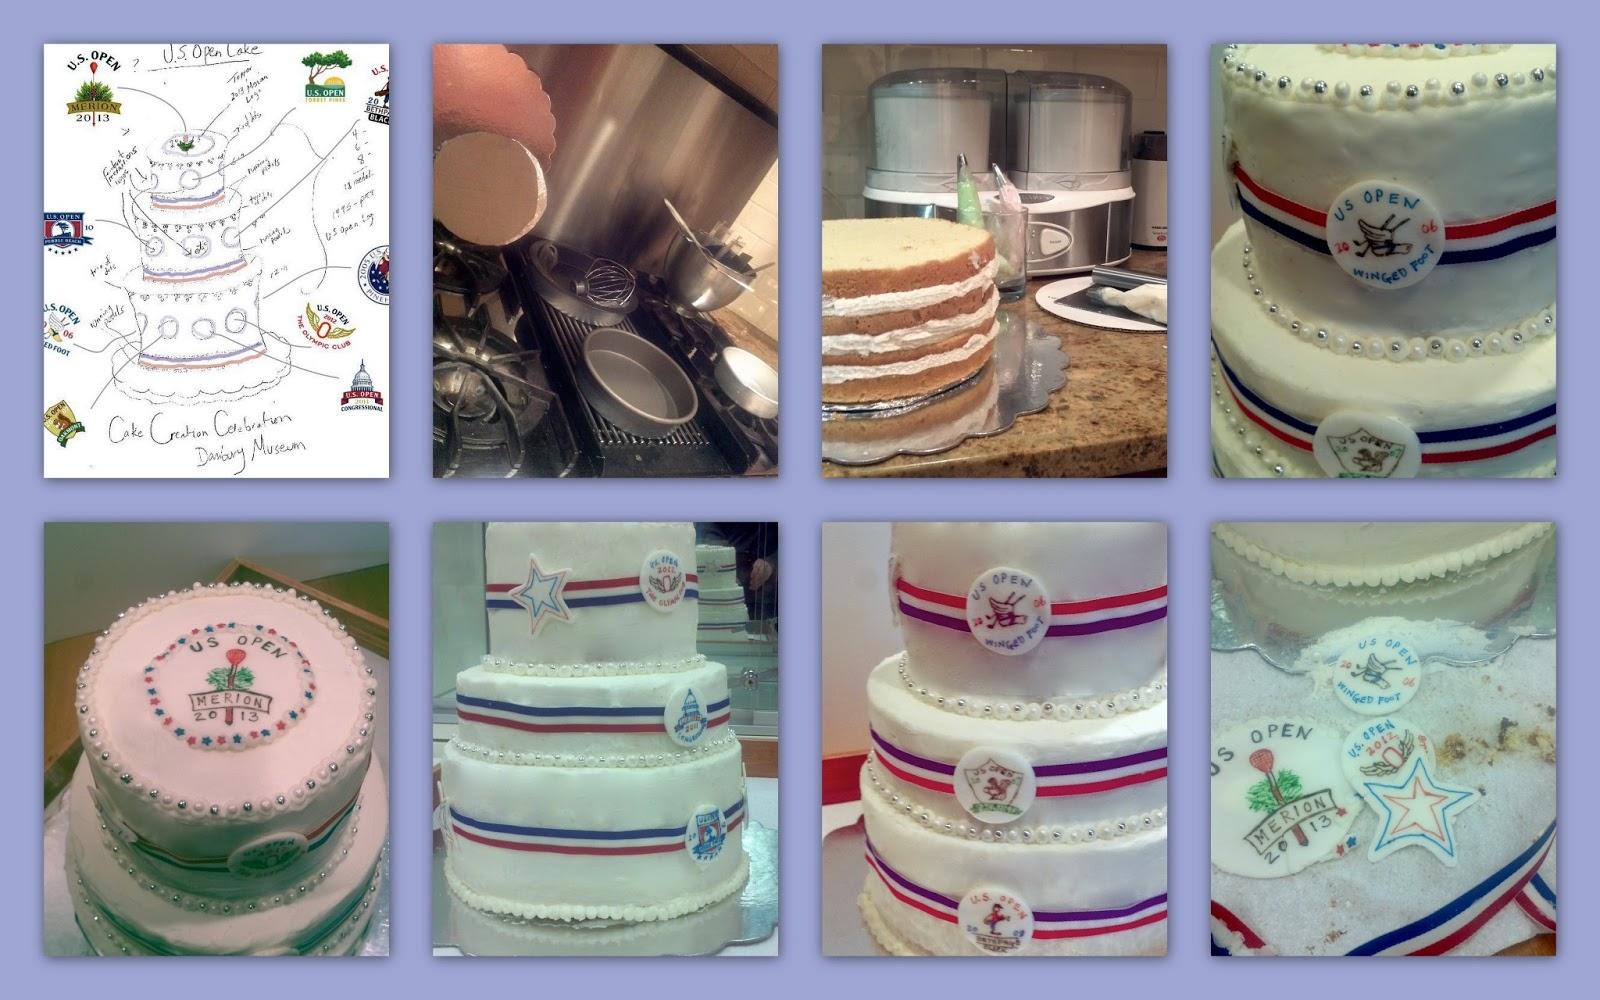 GOLF GIRL'S DIARY: Golf-inspired Cake Sweetens A Dreary ...